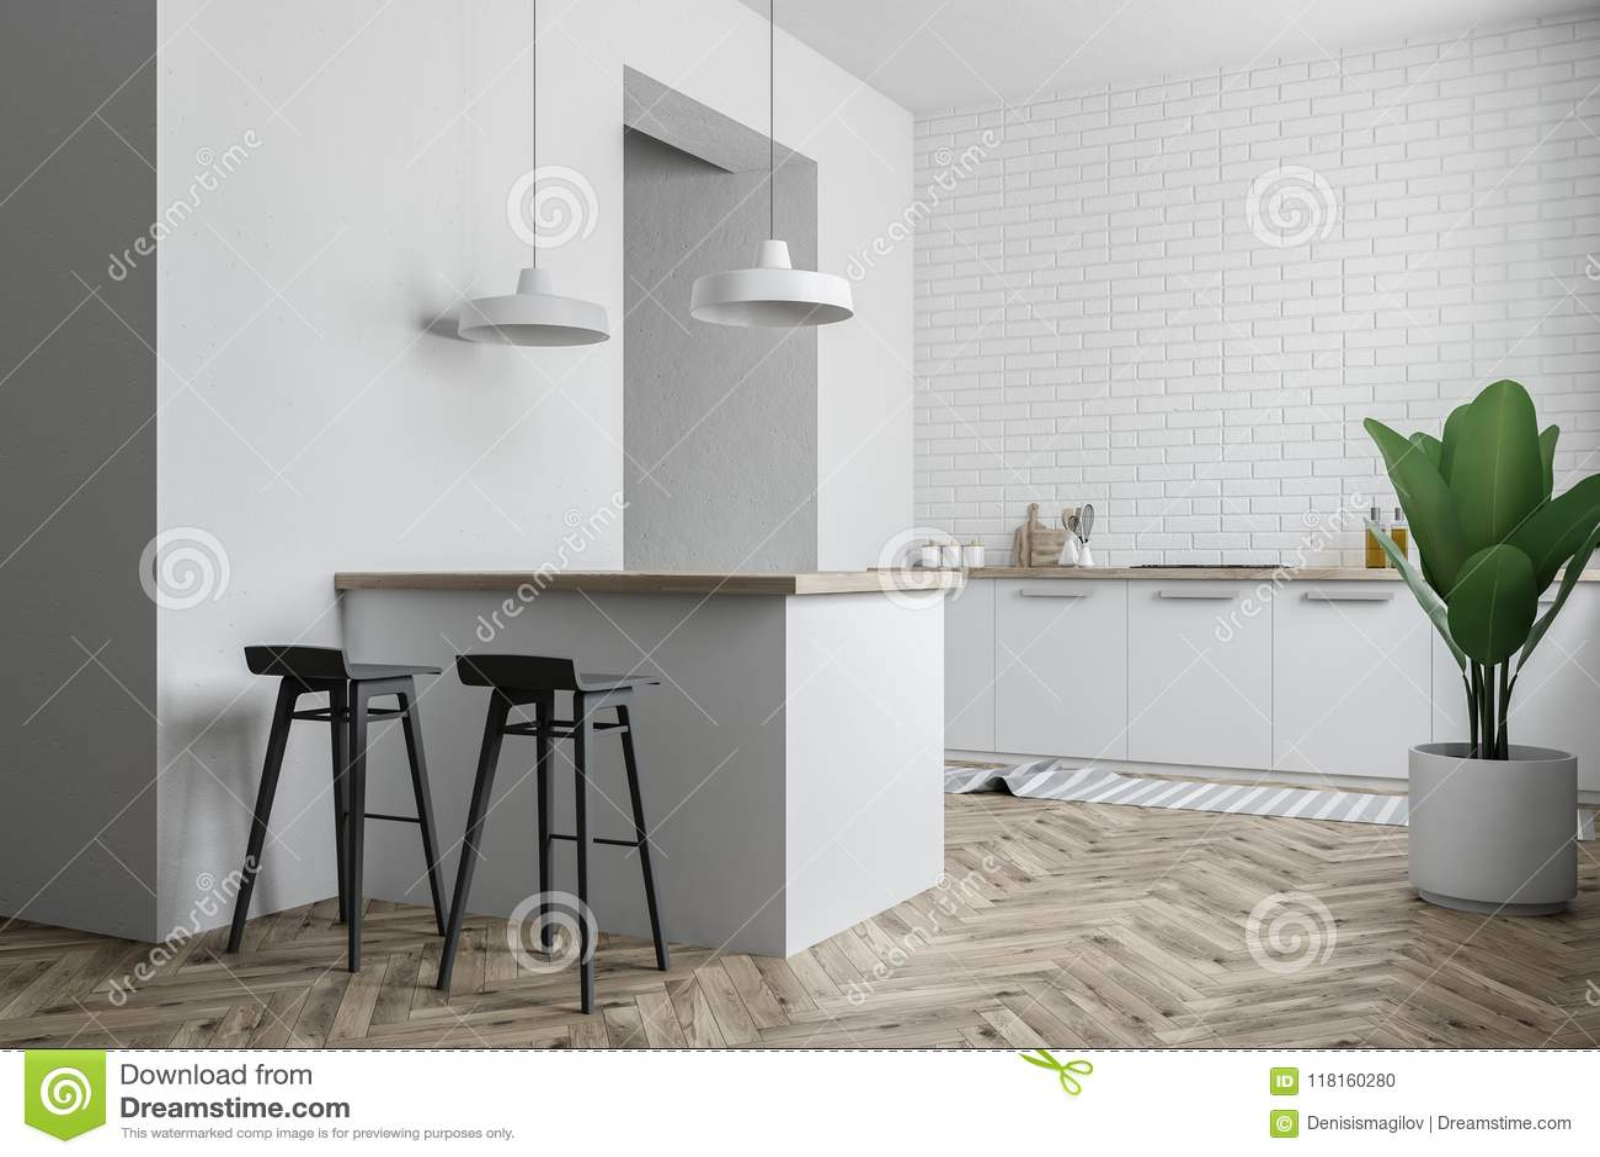 Brilliant White Modern Kitchen Interior Bar Stools Stock Illustration Alphanode Cool Chair Designs And Ideas Alphanodeonline